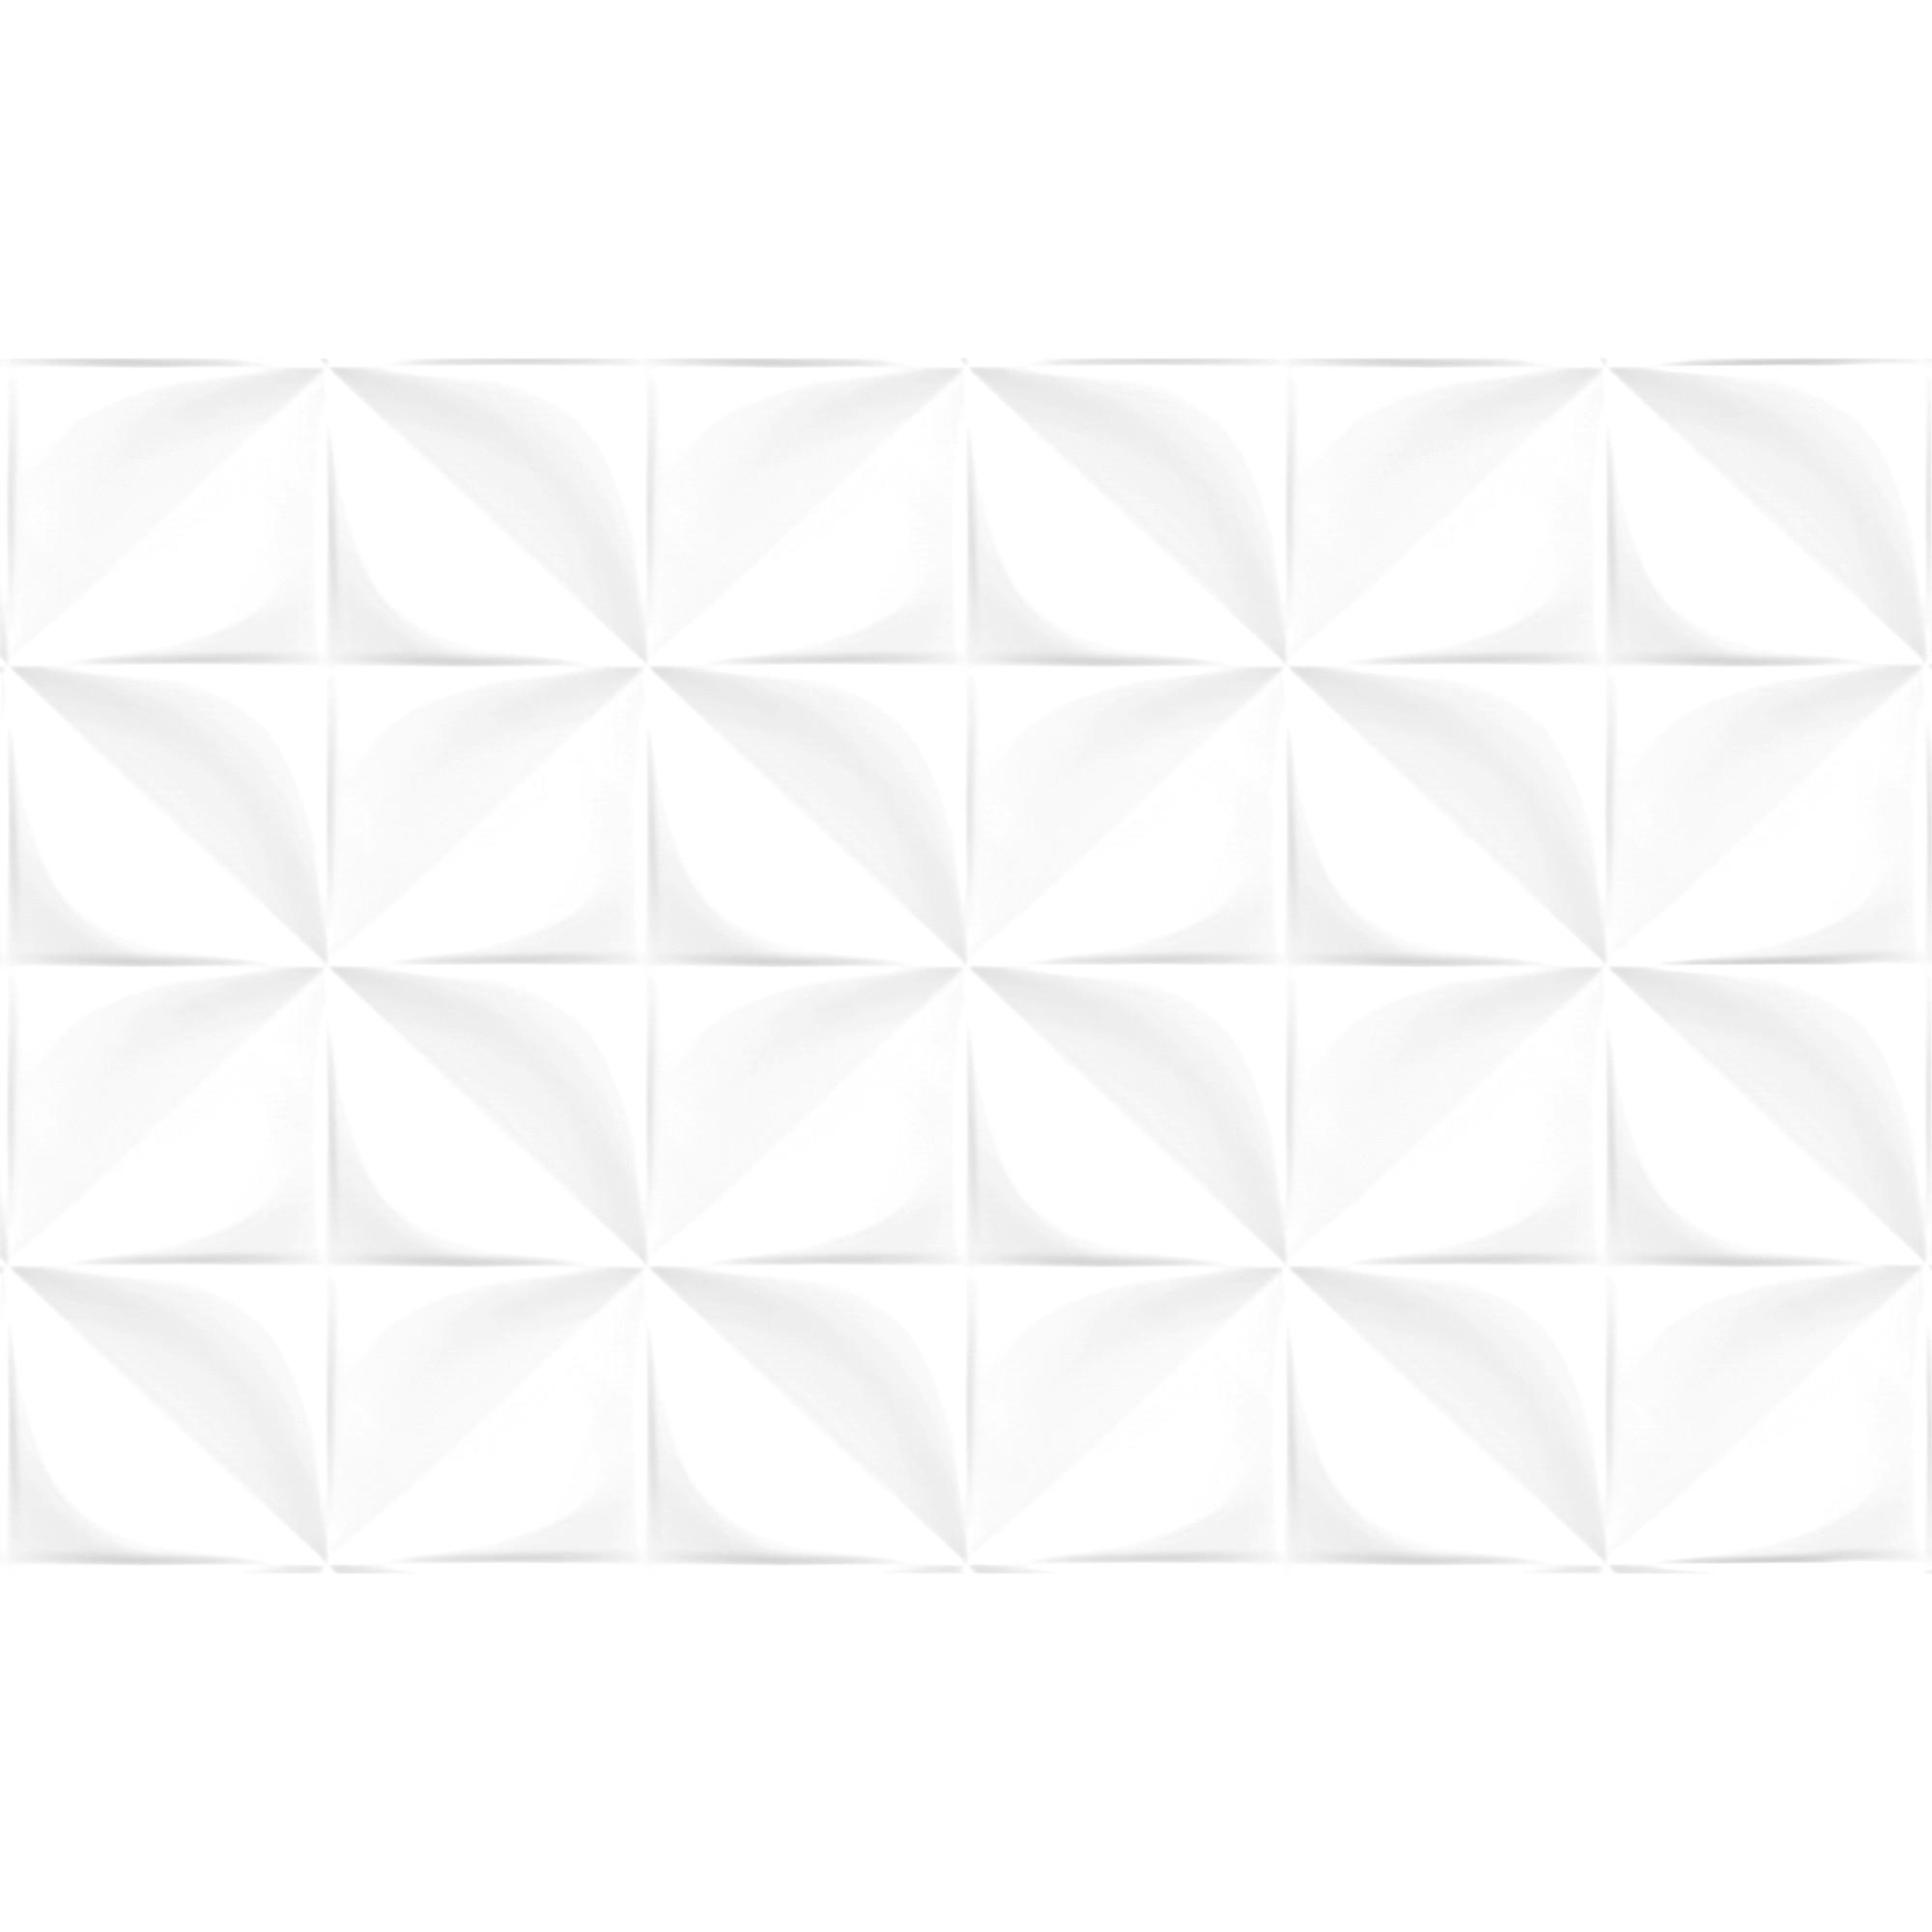 Revestimento Arielle Tipo A 36x58 cm Branco Esmaltado com Alto Relevo 232m Tecnologia de Impressao Digital HD